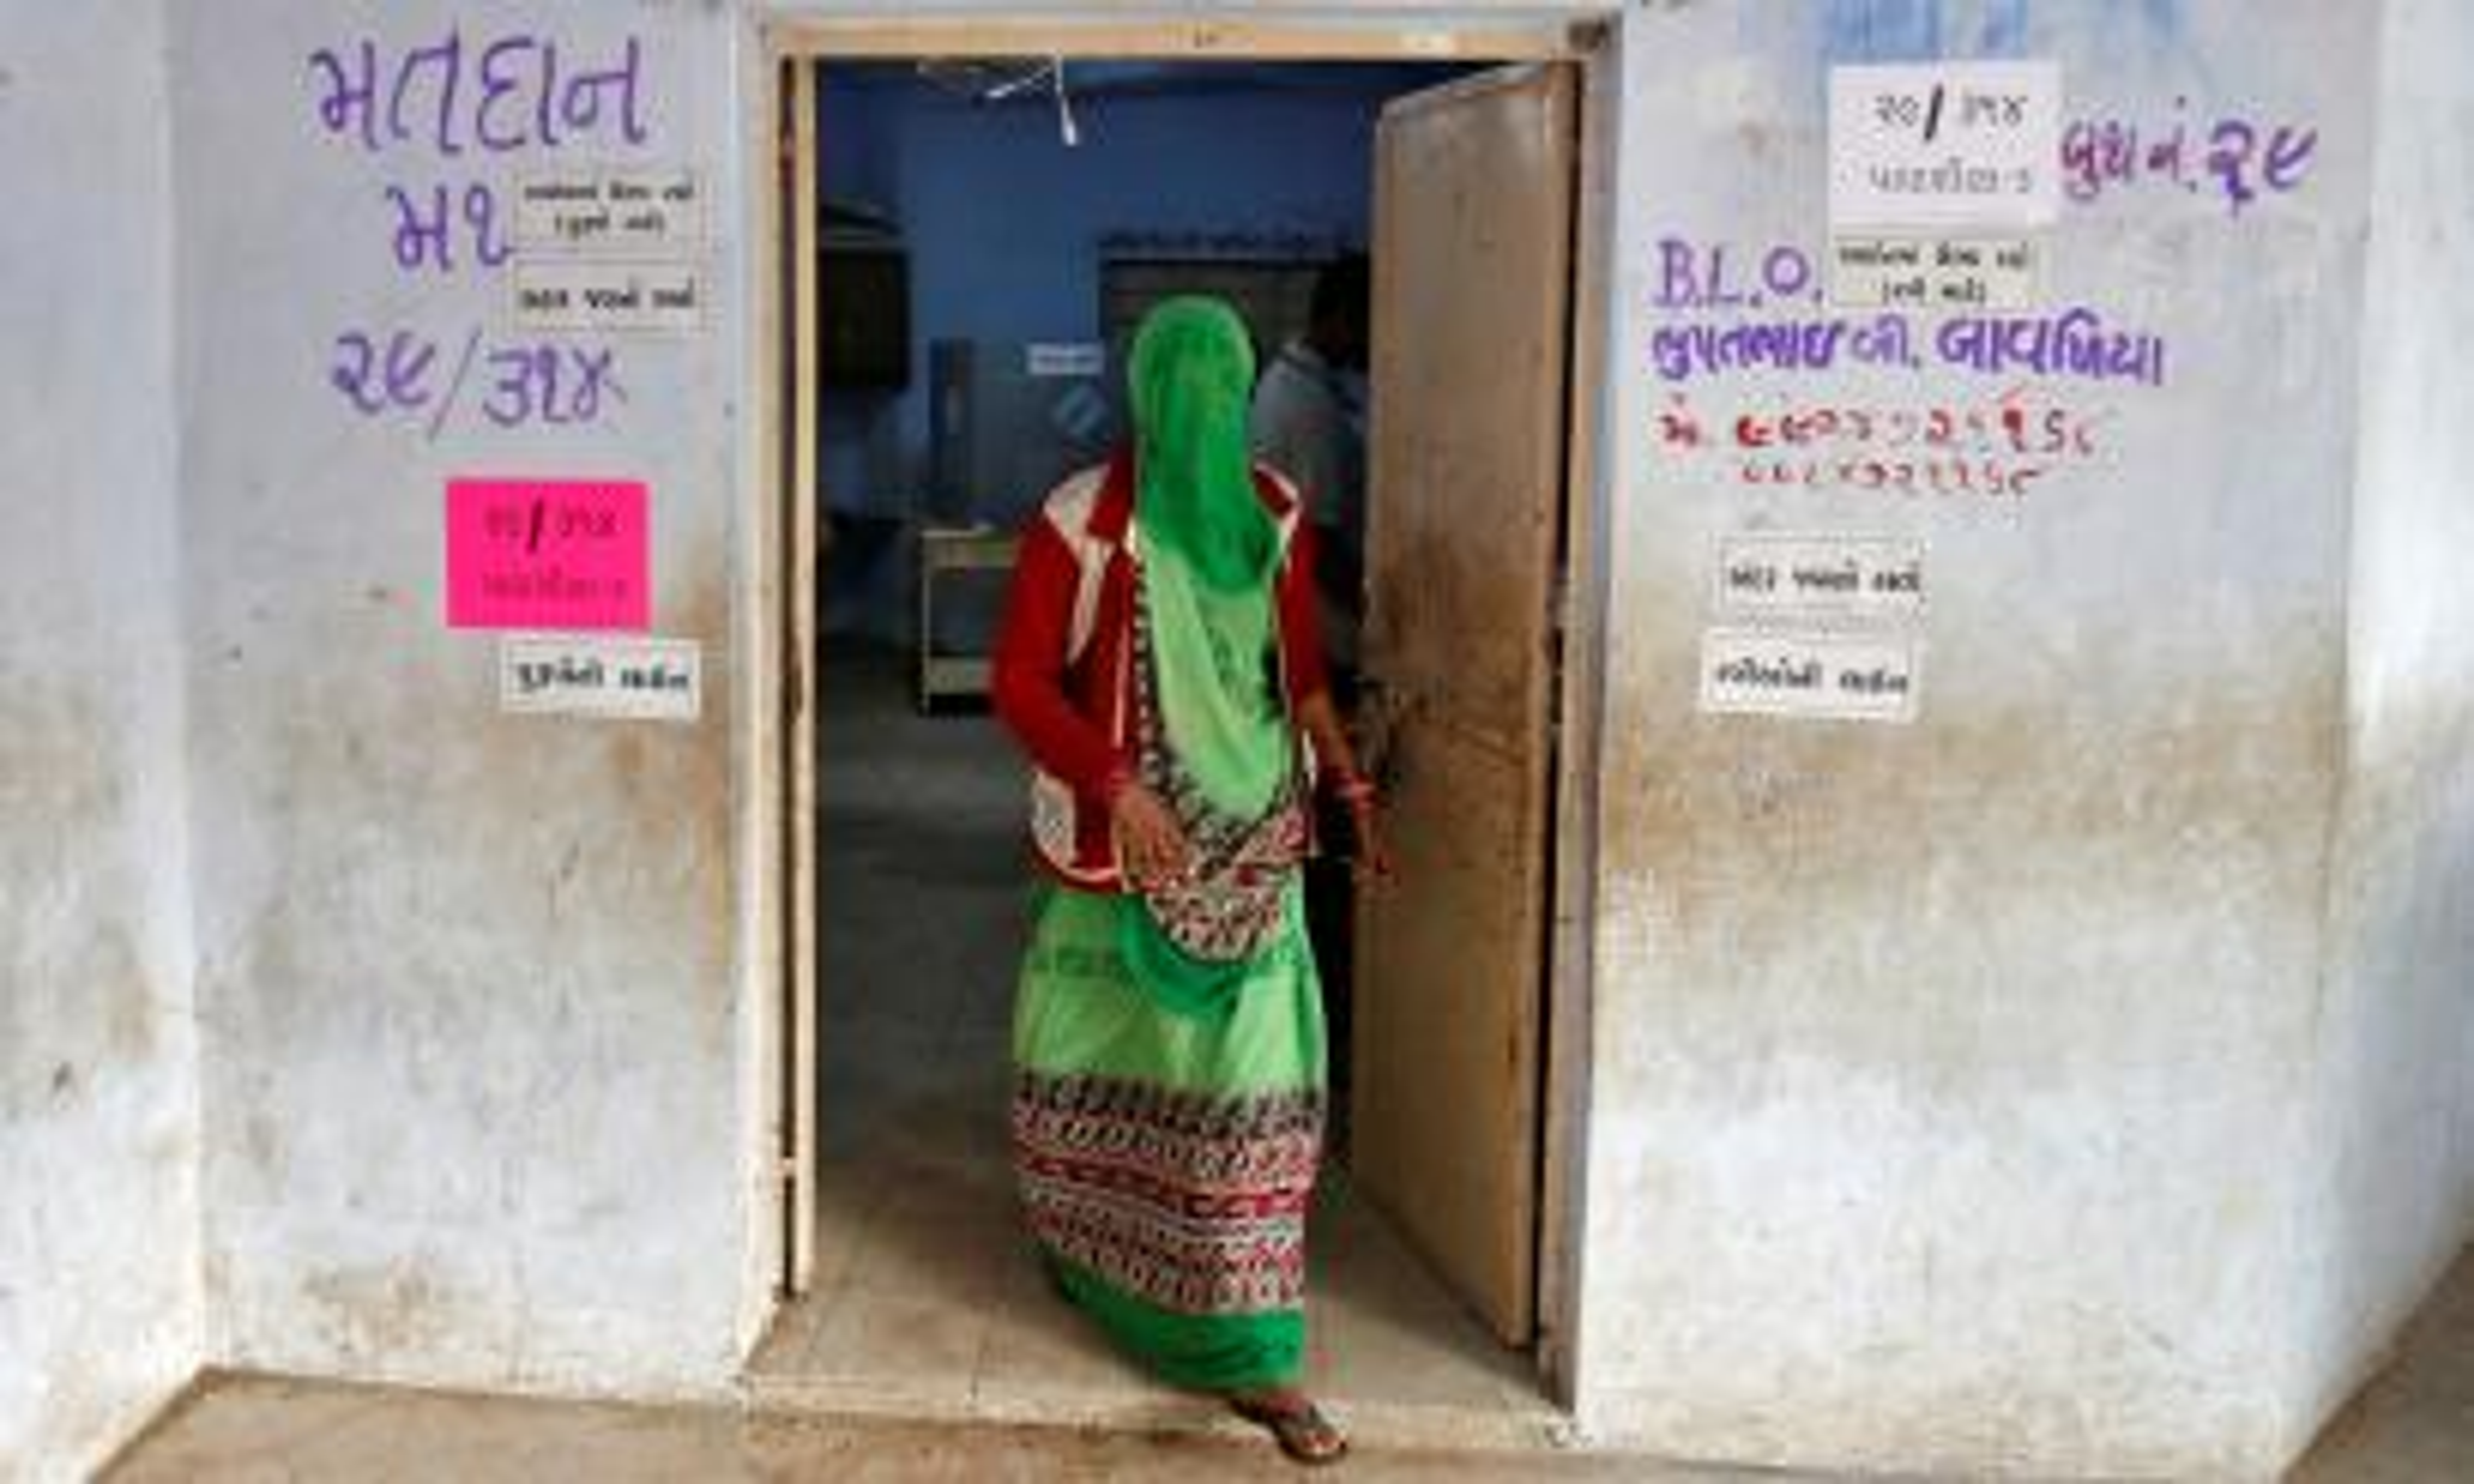 india-election-eci